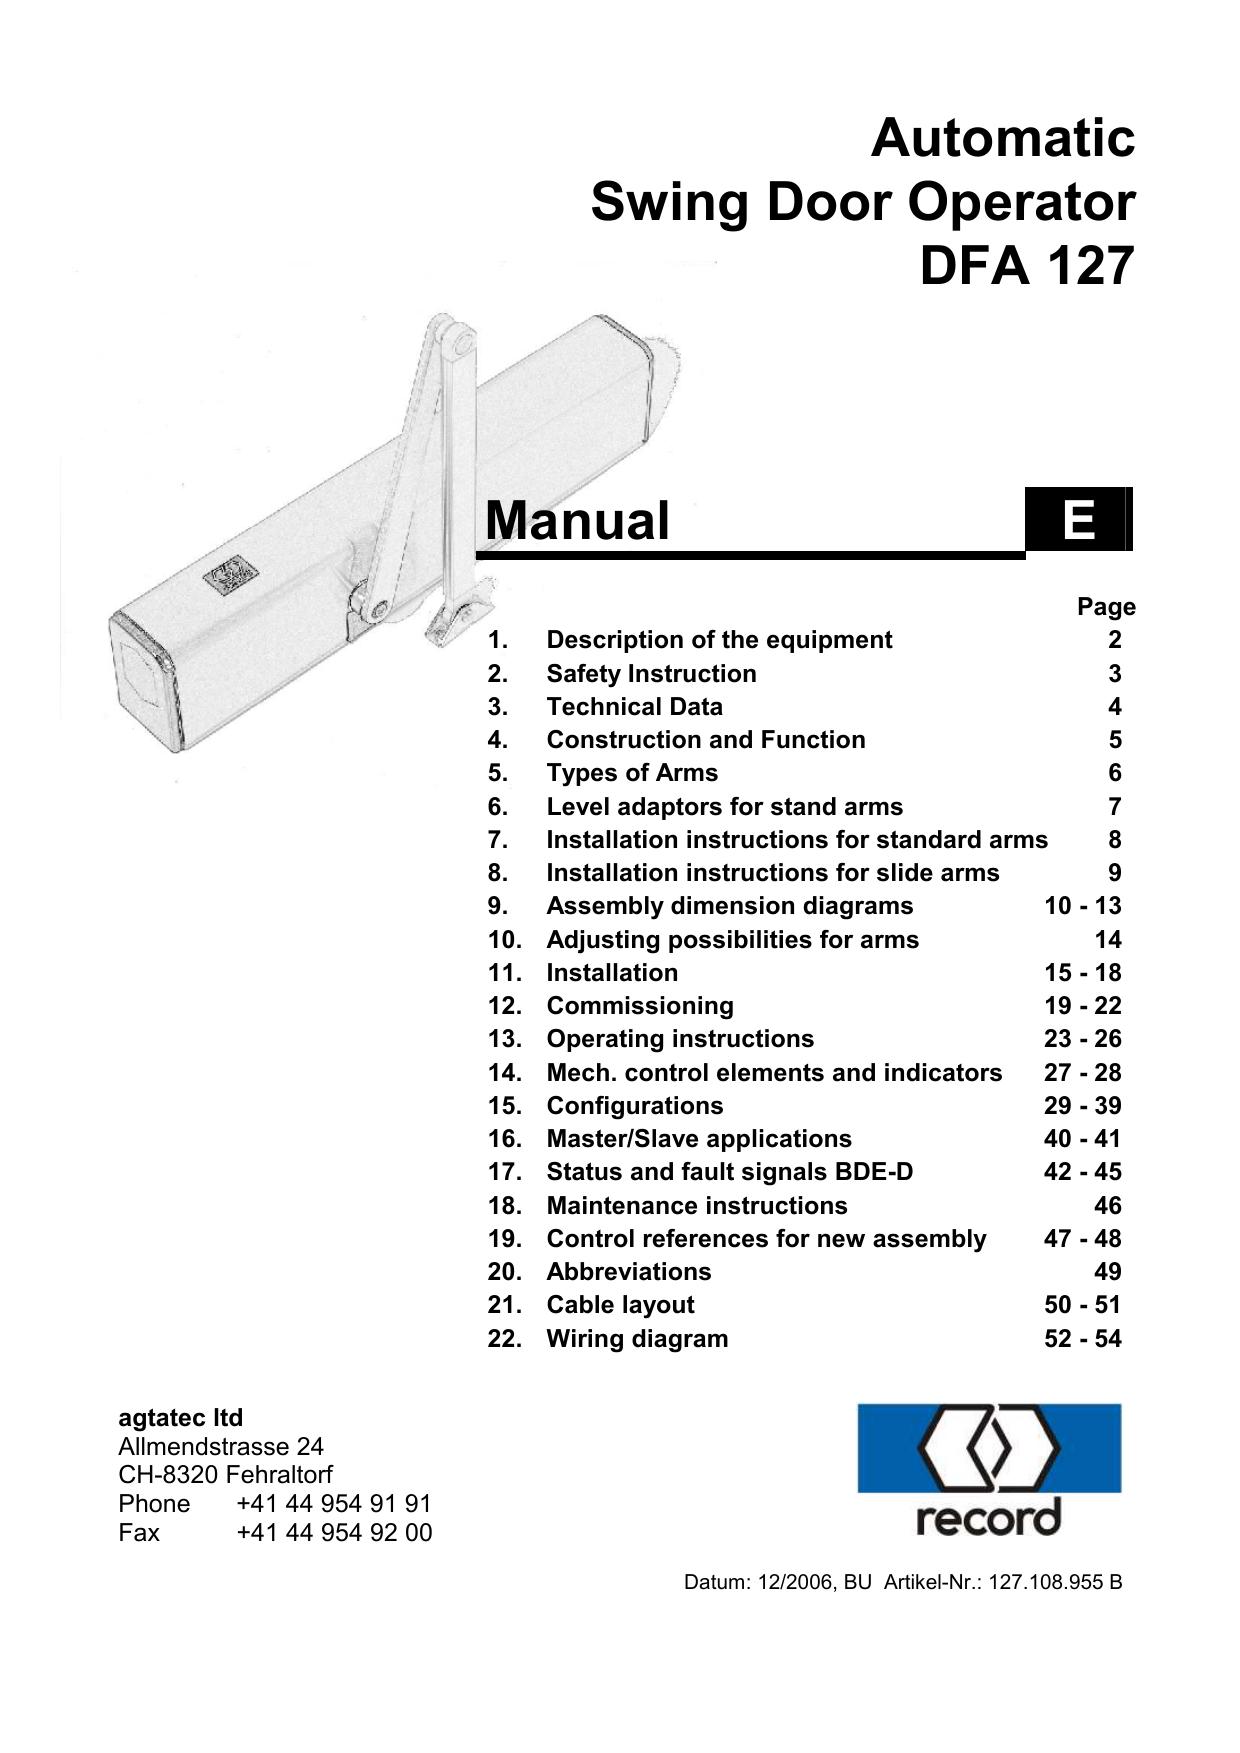 Automatic Swing Door Operator Dfa 127 Manual E